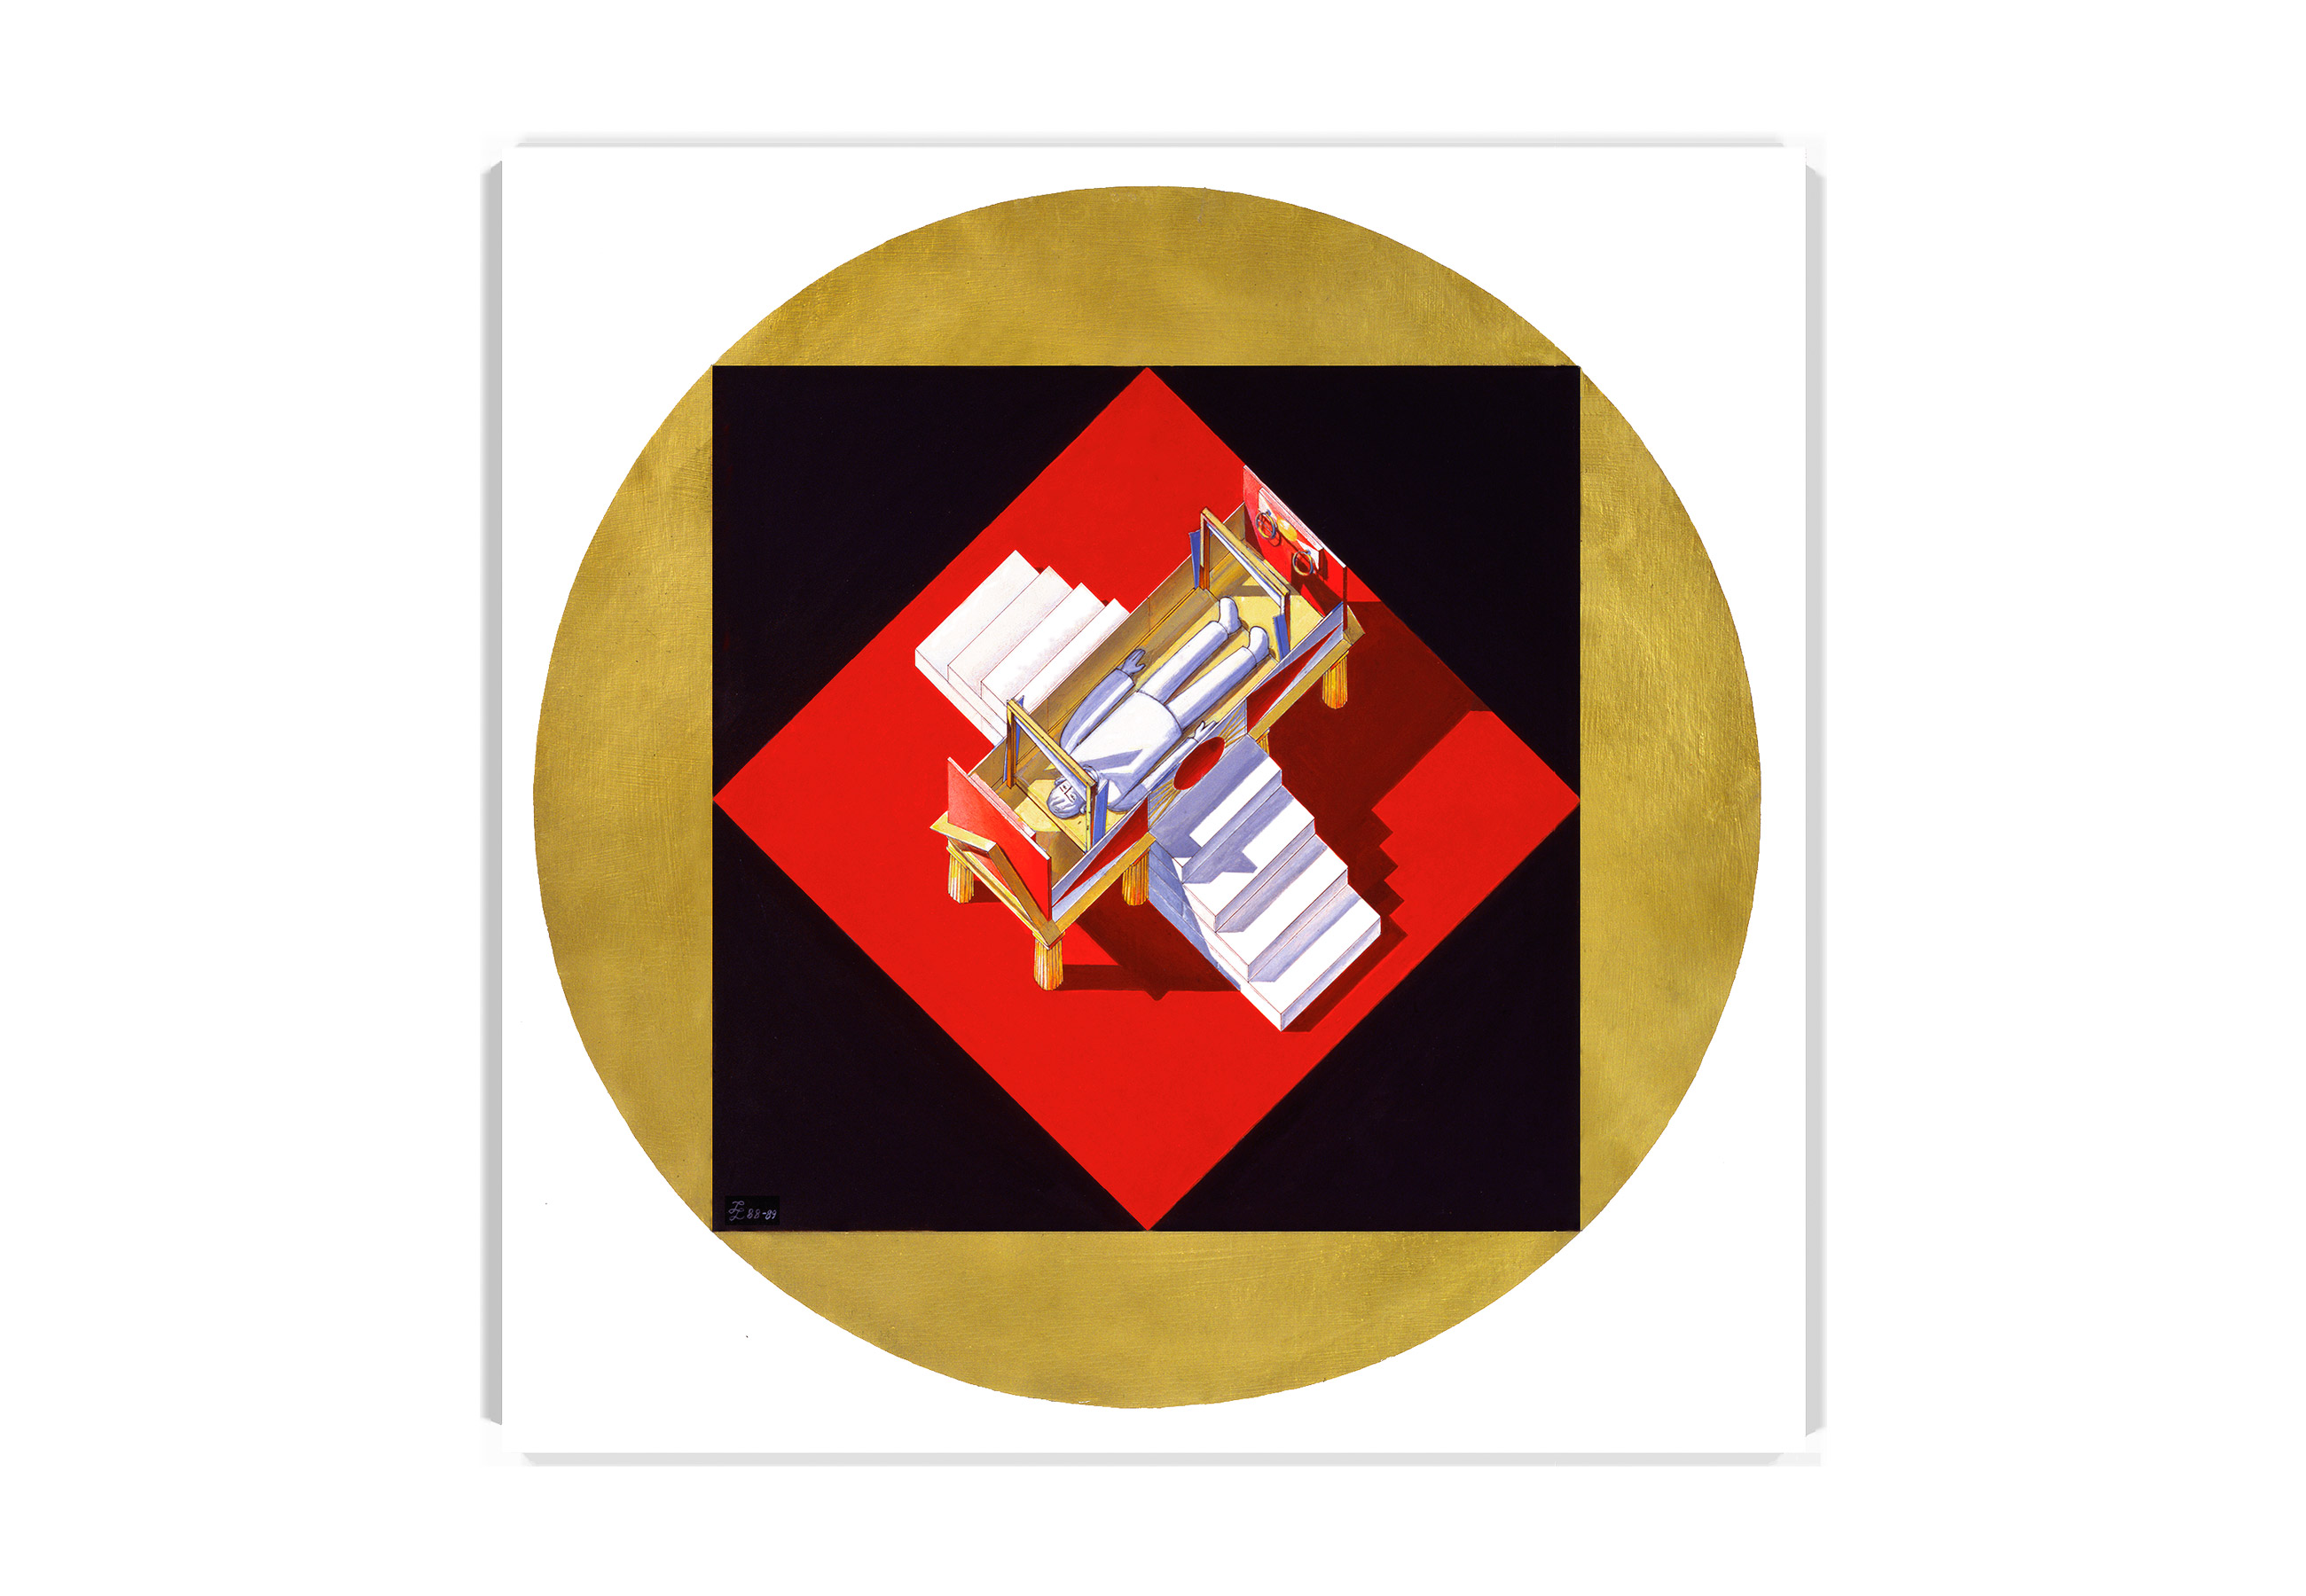 Lamm-Portfolio-1987-1990-16.jpg